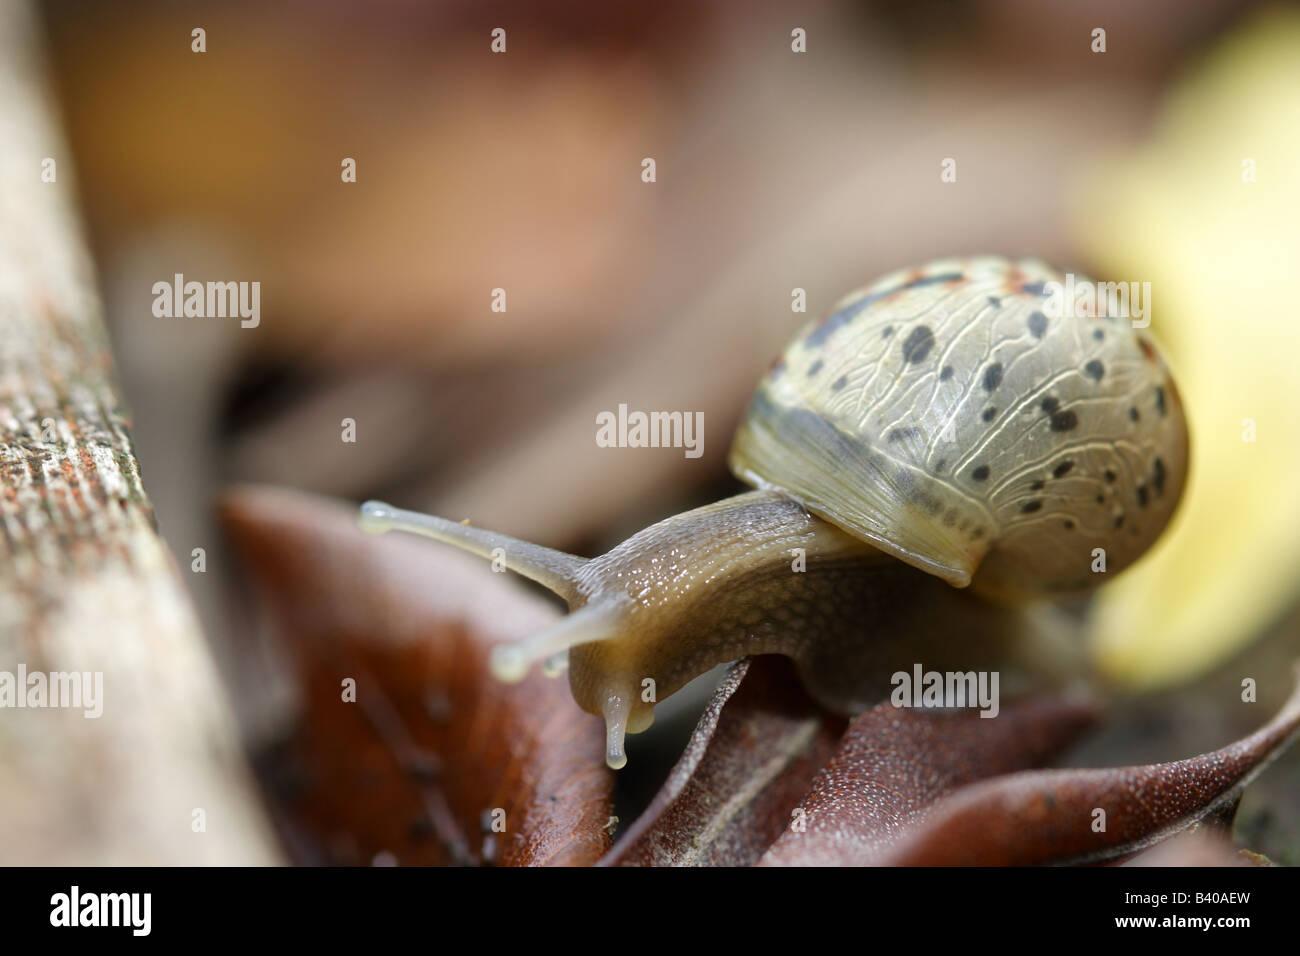 Garden land snail in nature environments Stock Photo